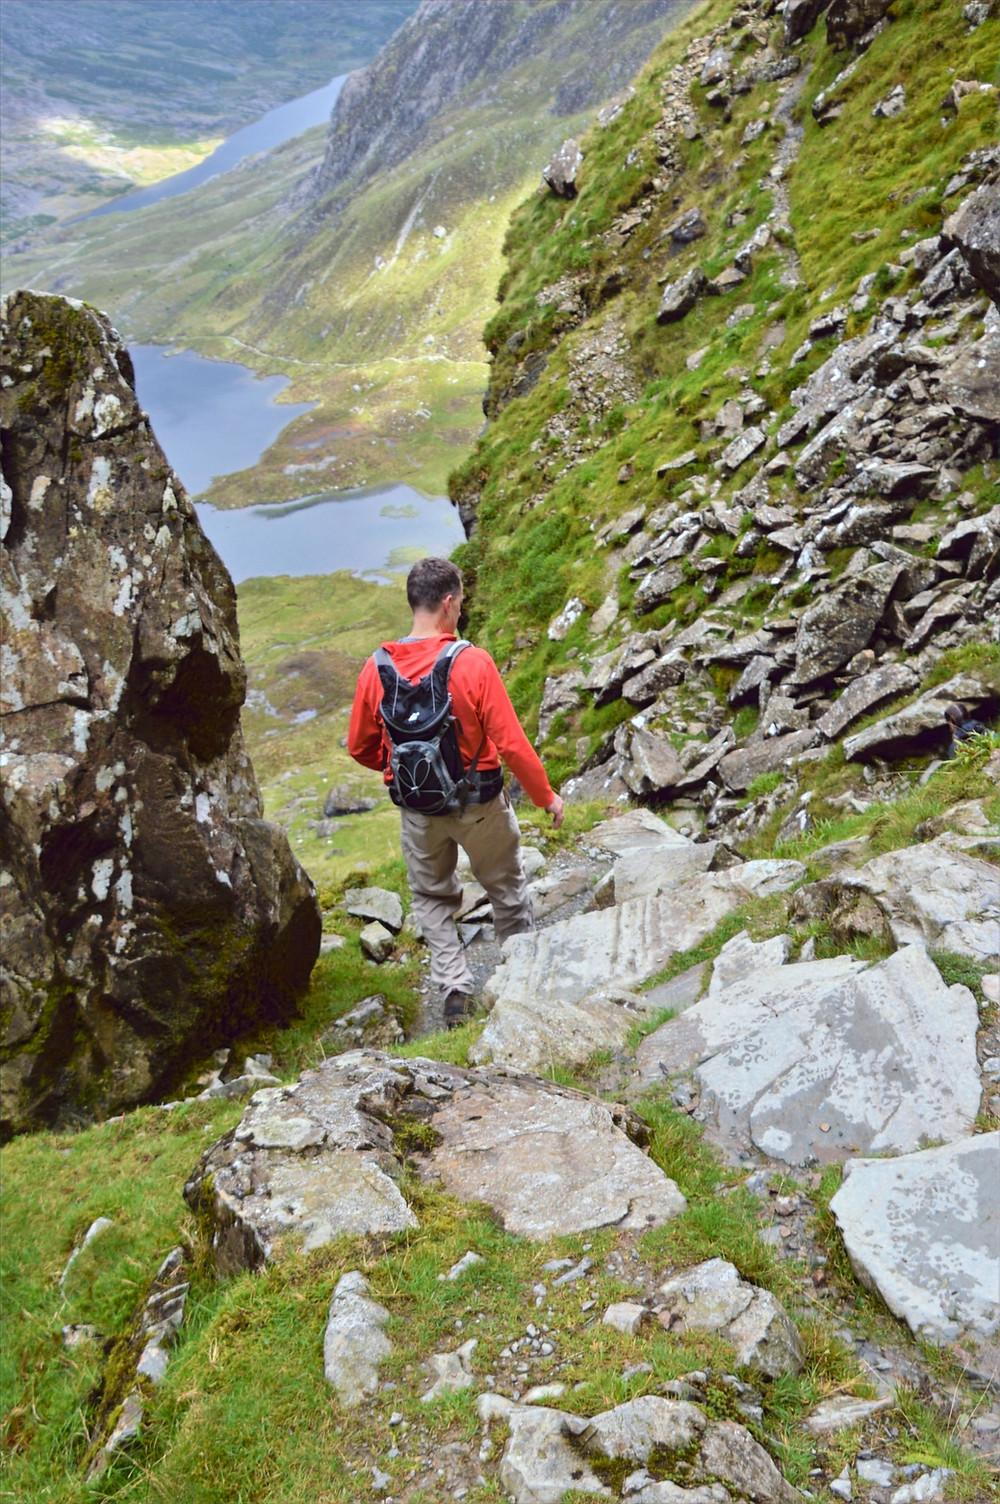 Climbing through boulder field on path from Devil's Kitchen in Snowdonia